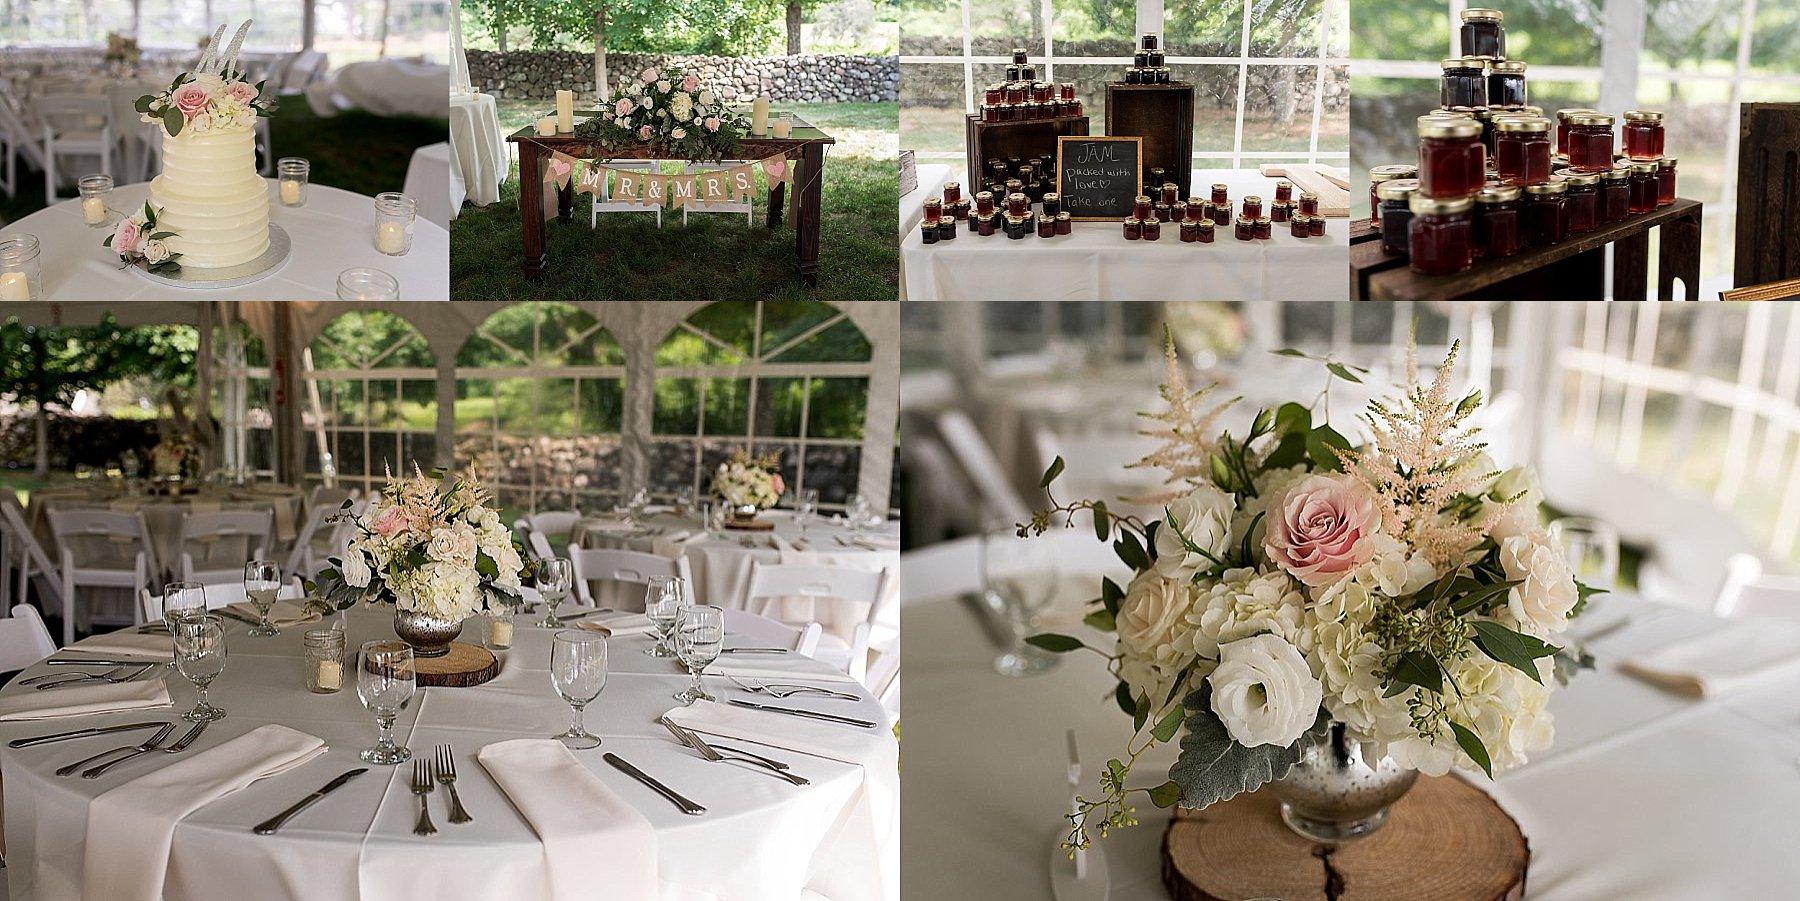 wedding reception details at farmington, ct venue